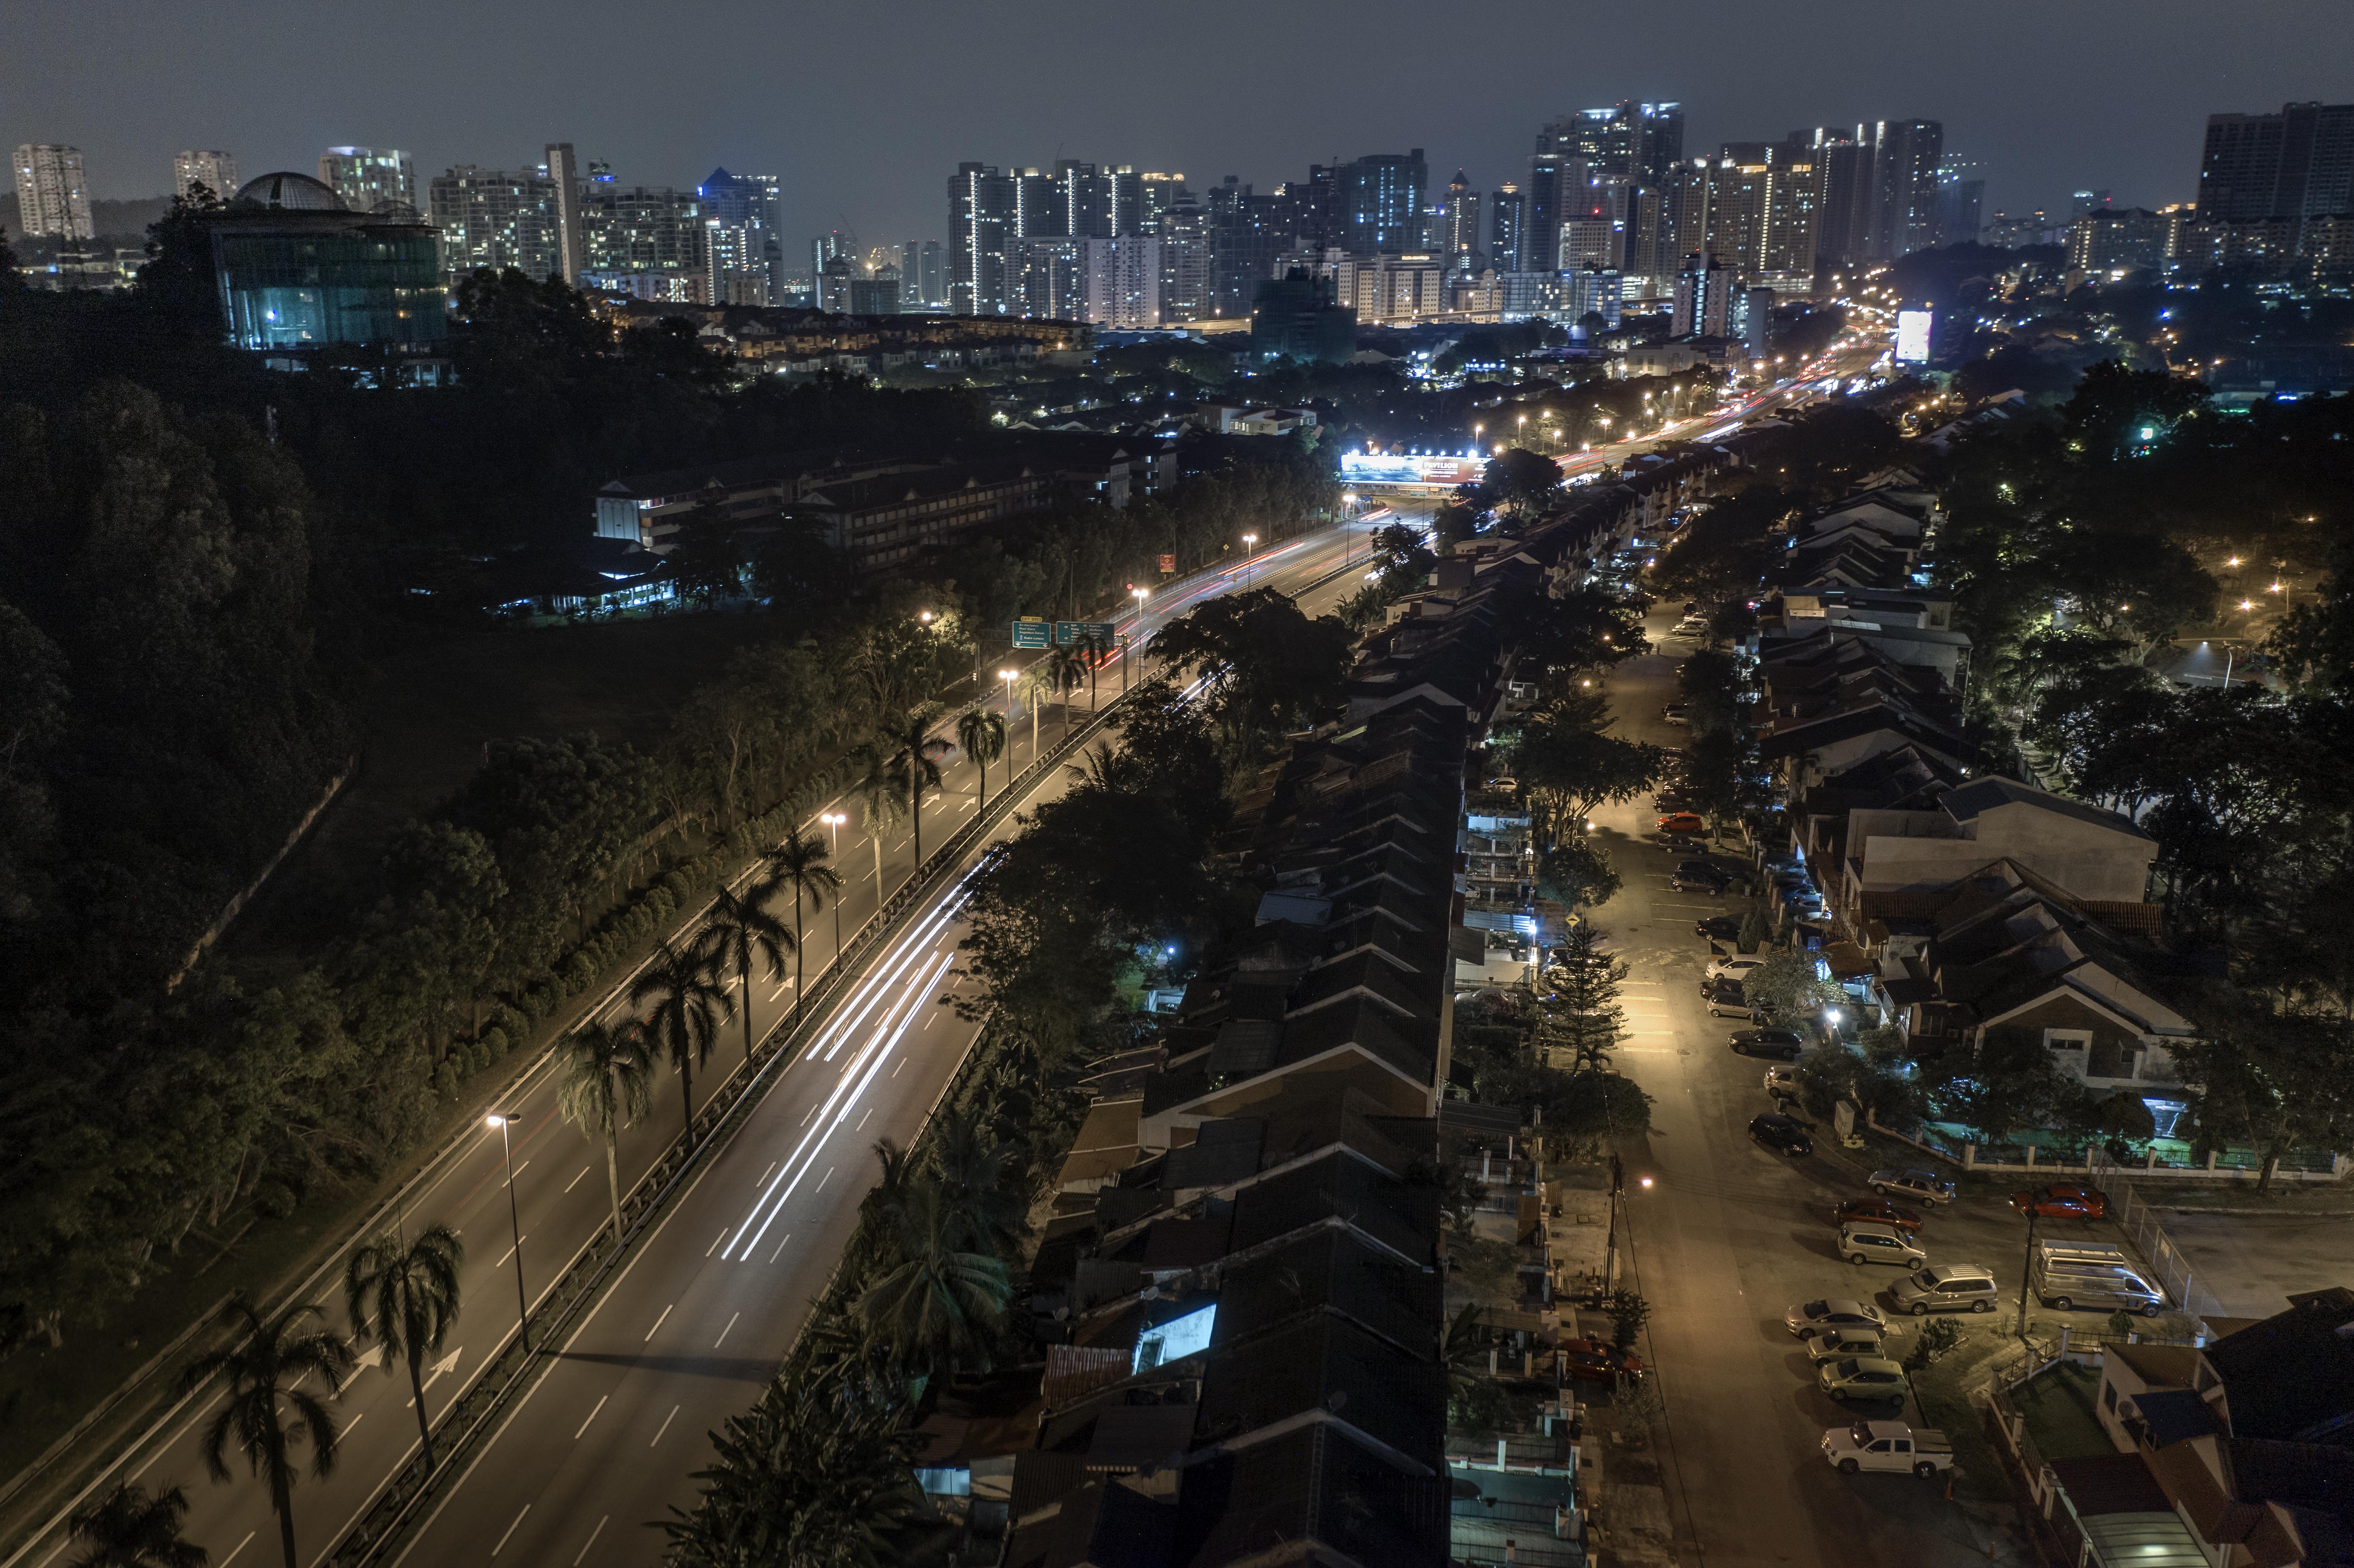 Drone diaries: the 2018 DJI Mavic 2 Pro review – Ming Thein